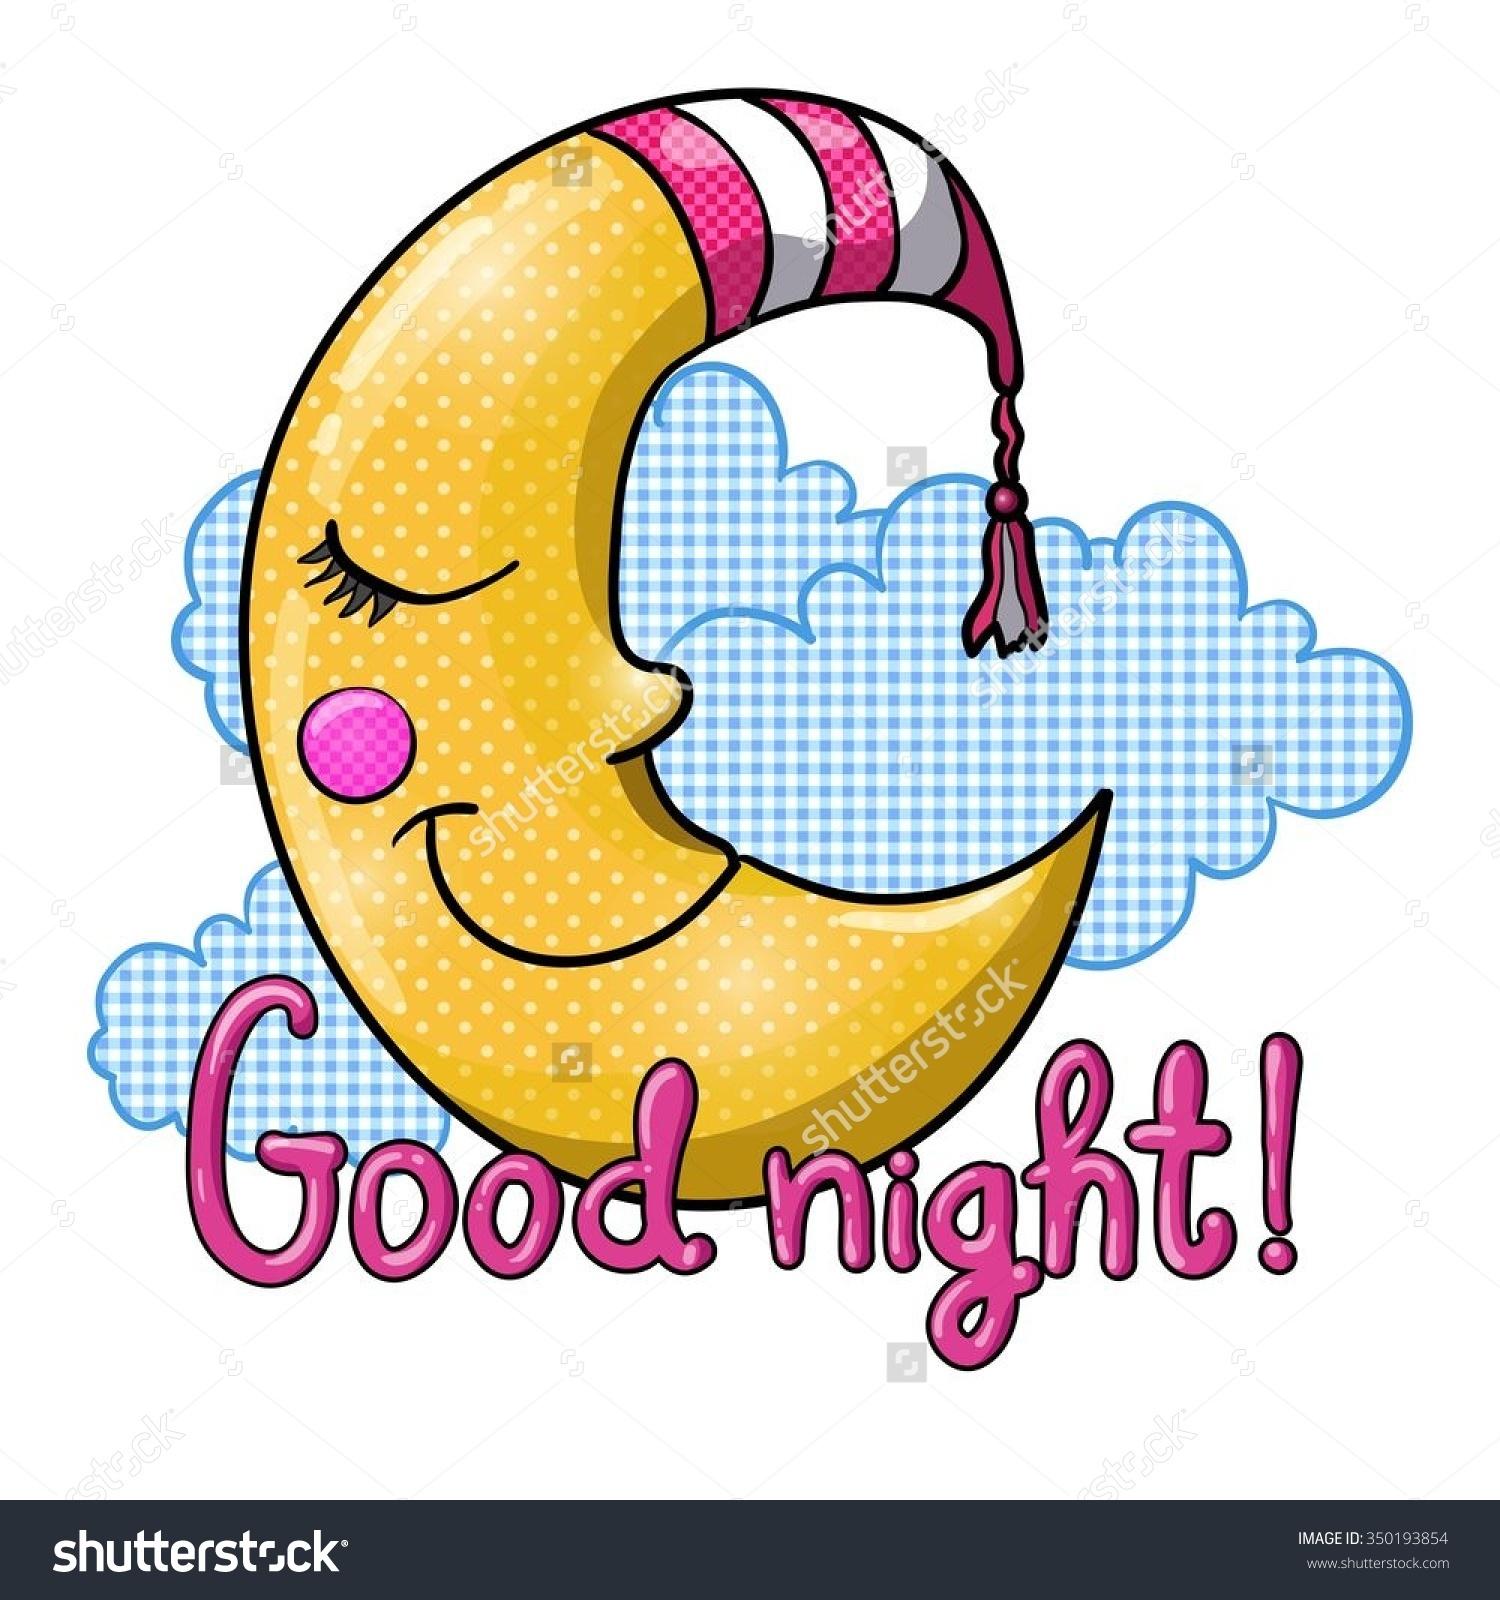 1500x1600 Good Night Clip Art Many Interesting Cliparts